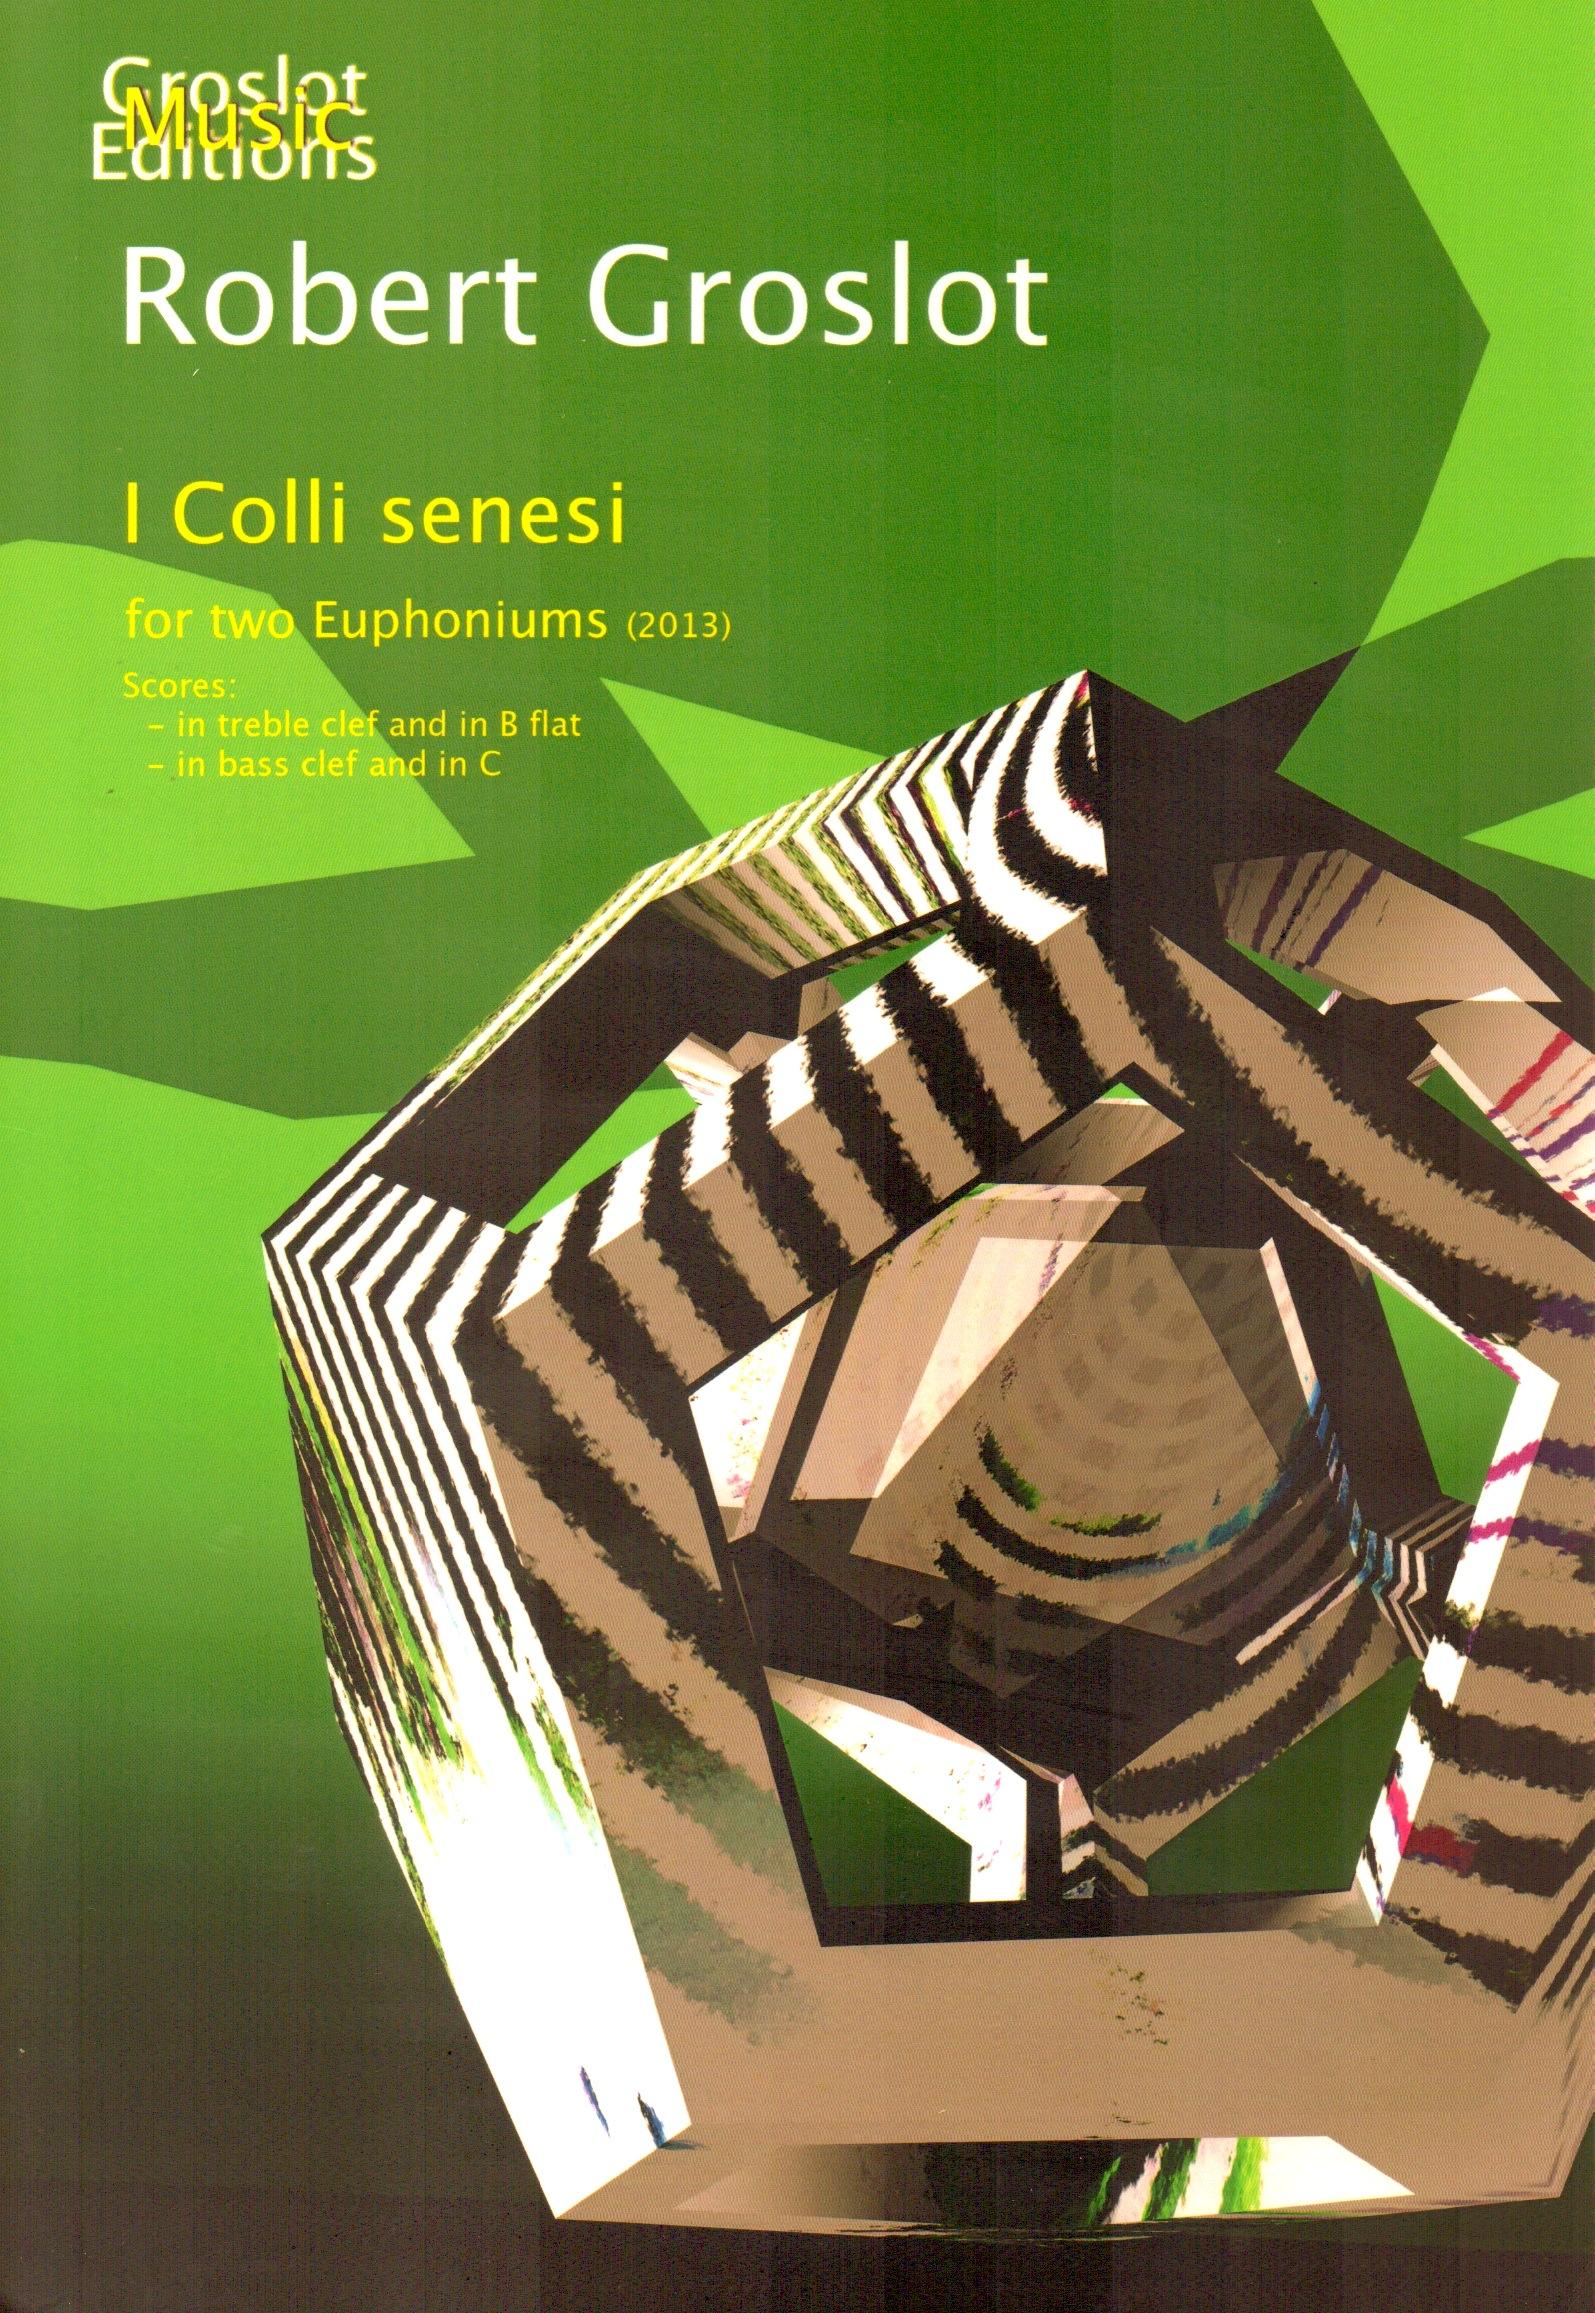 I Colli Senesi for 2 Euphonium (unaccompanied) - Robert Groslot